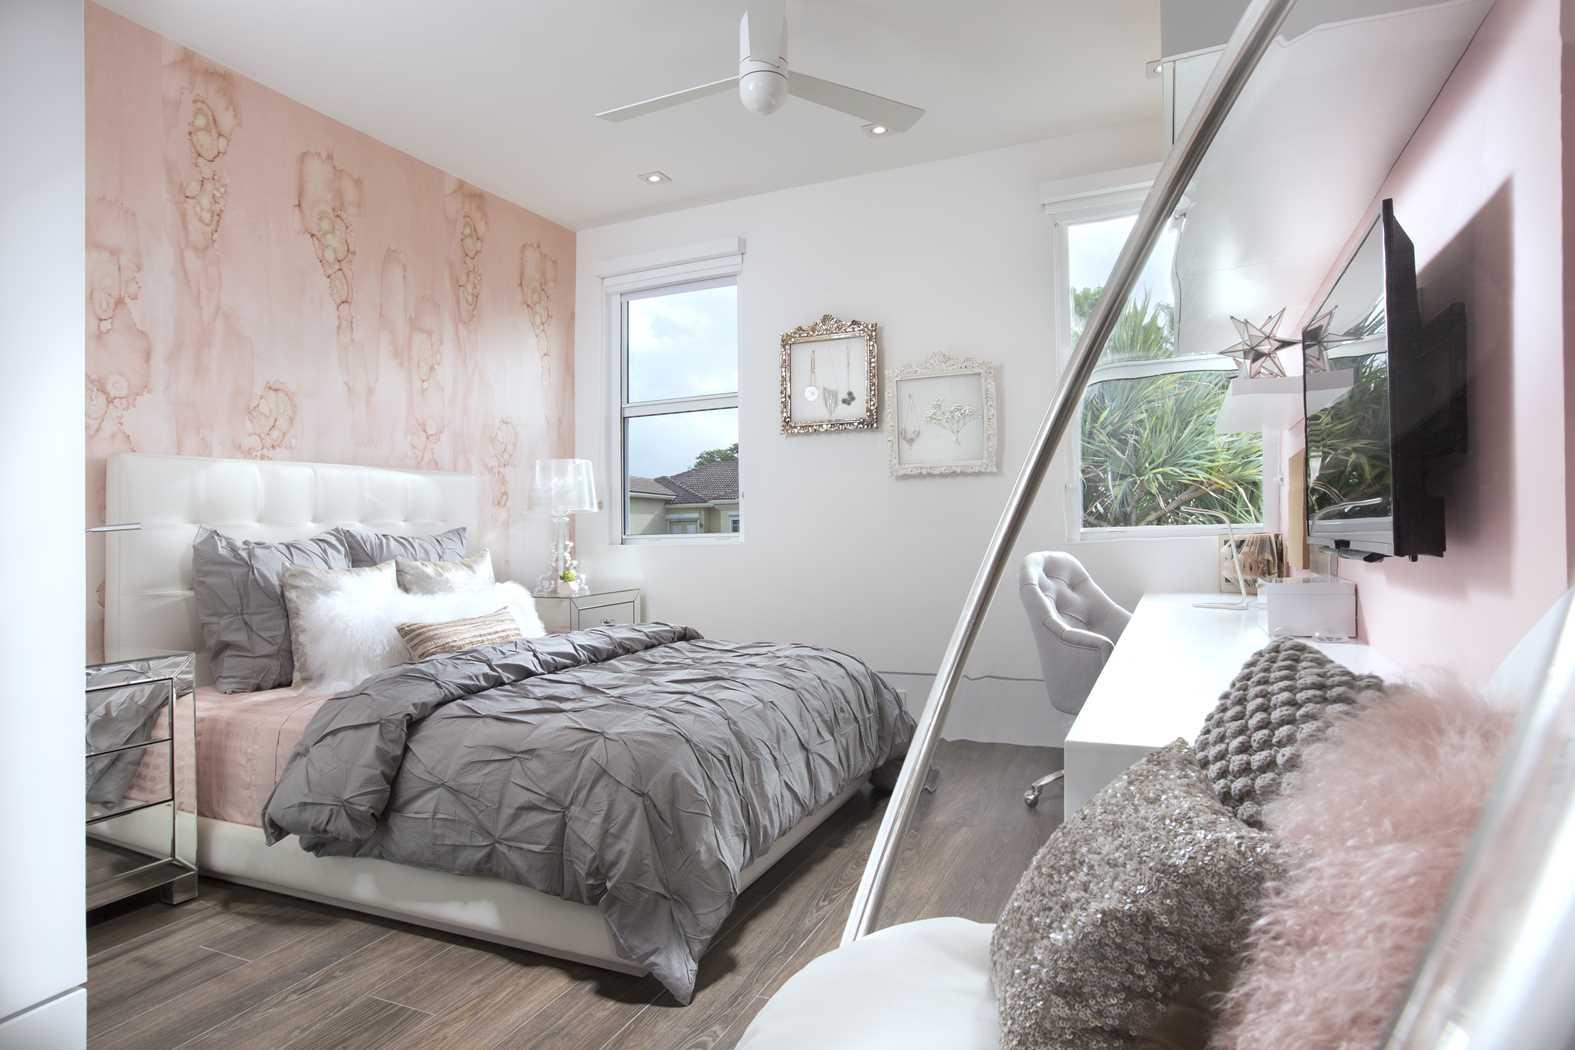 Contemporary Twilight Residential Interior Design From DKOR Interiors